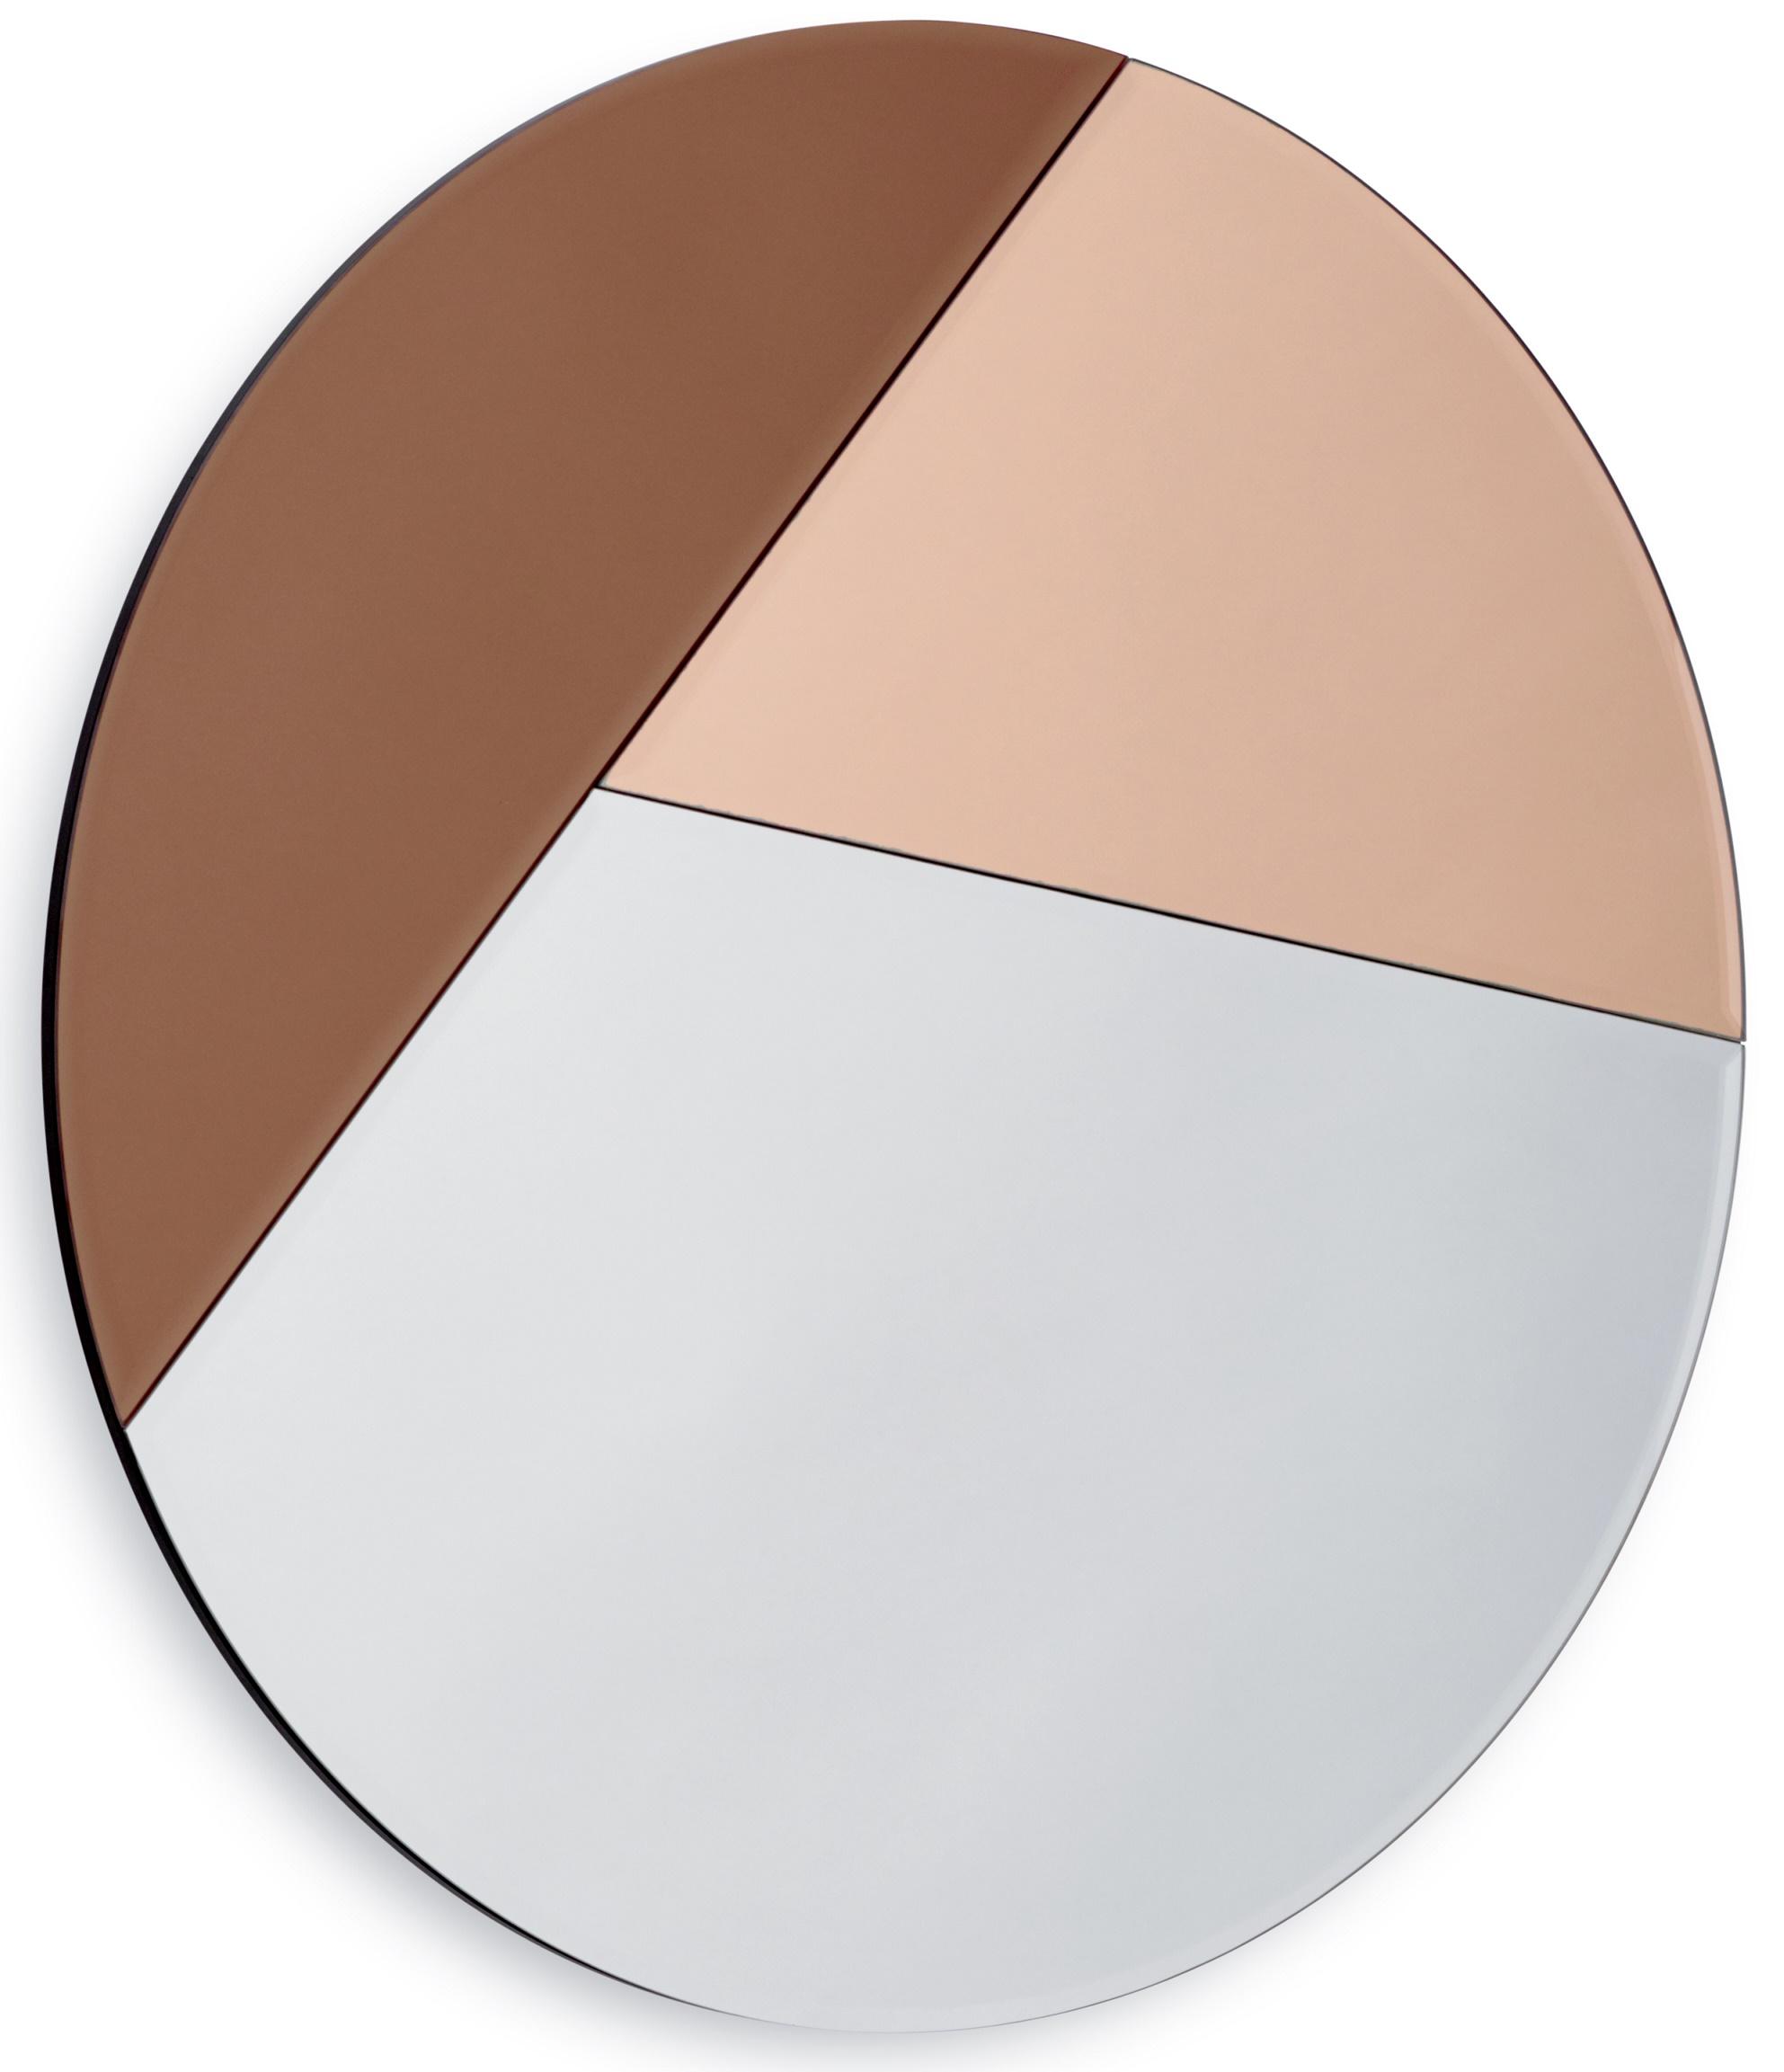 Nouveau spegel - 70